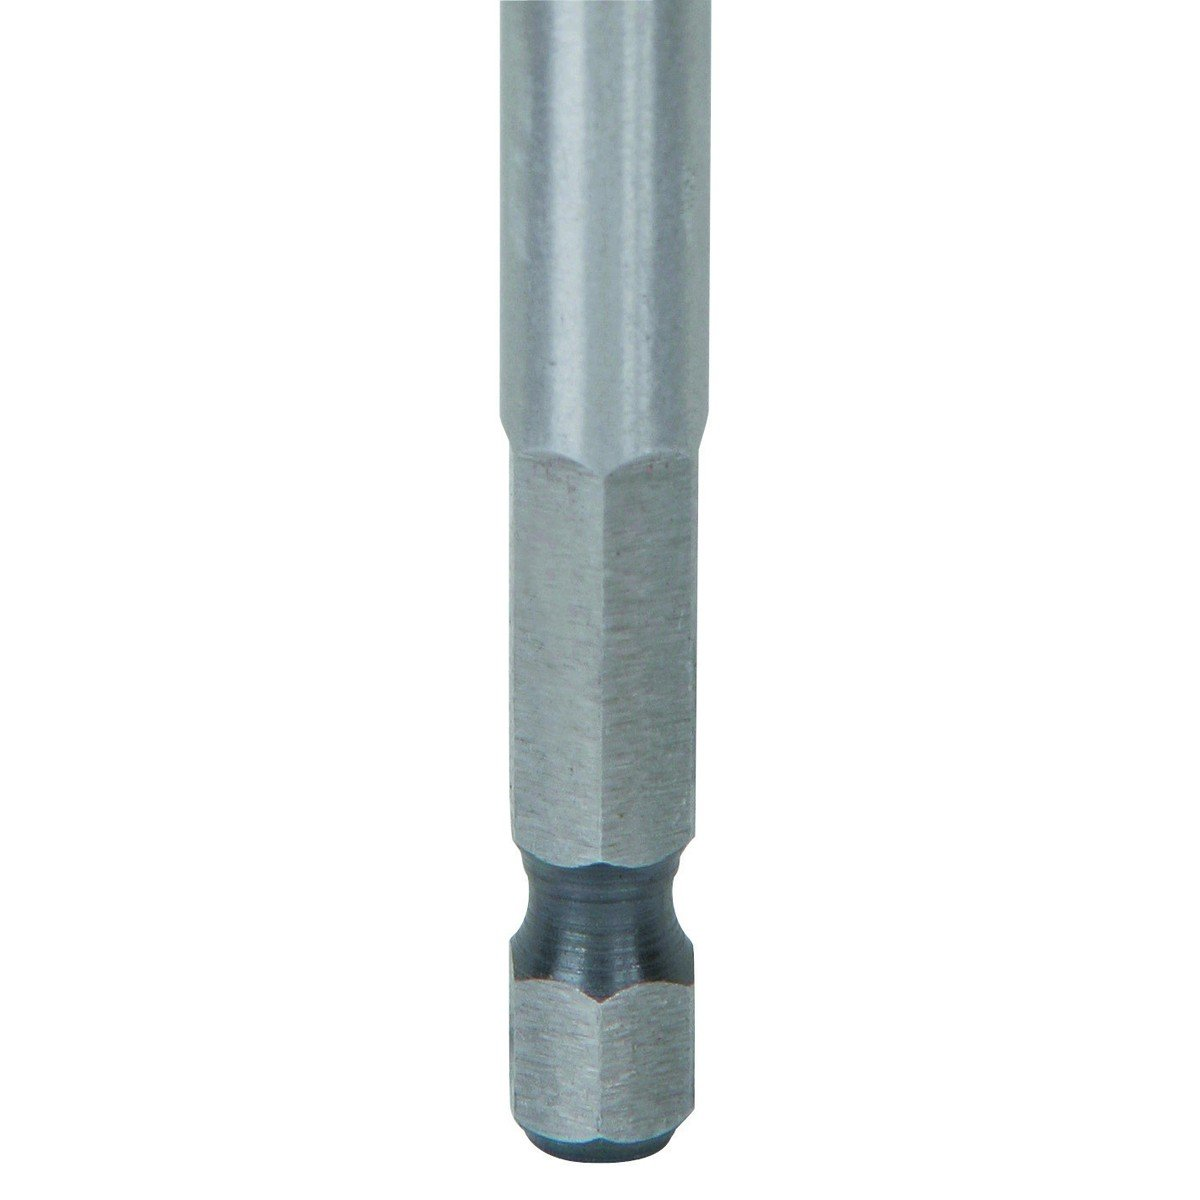 13 Piece Professional Titanium Spade Bit Set Drill Master